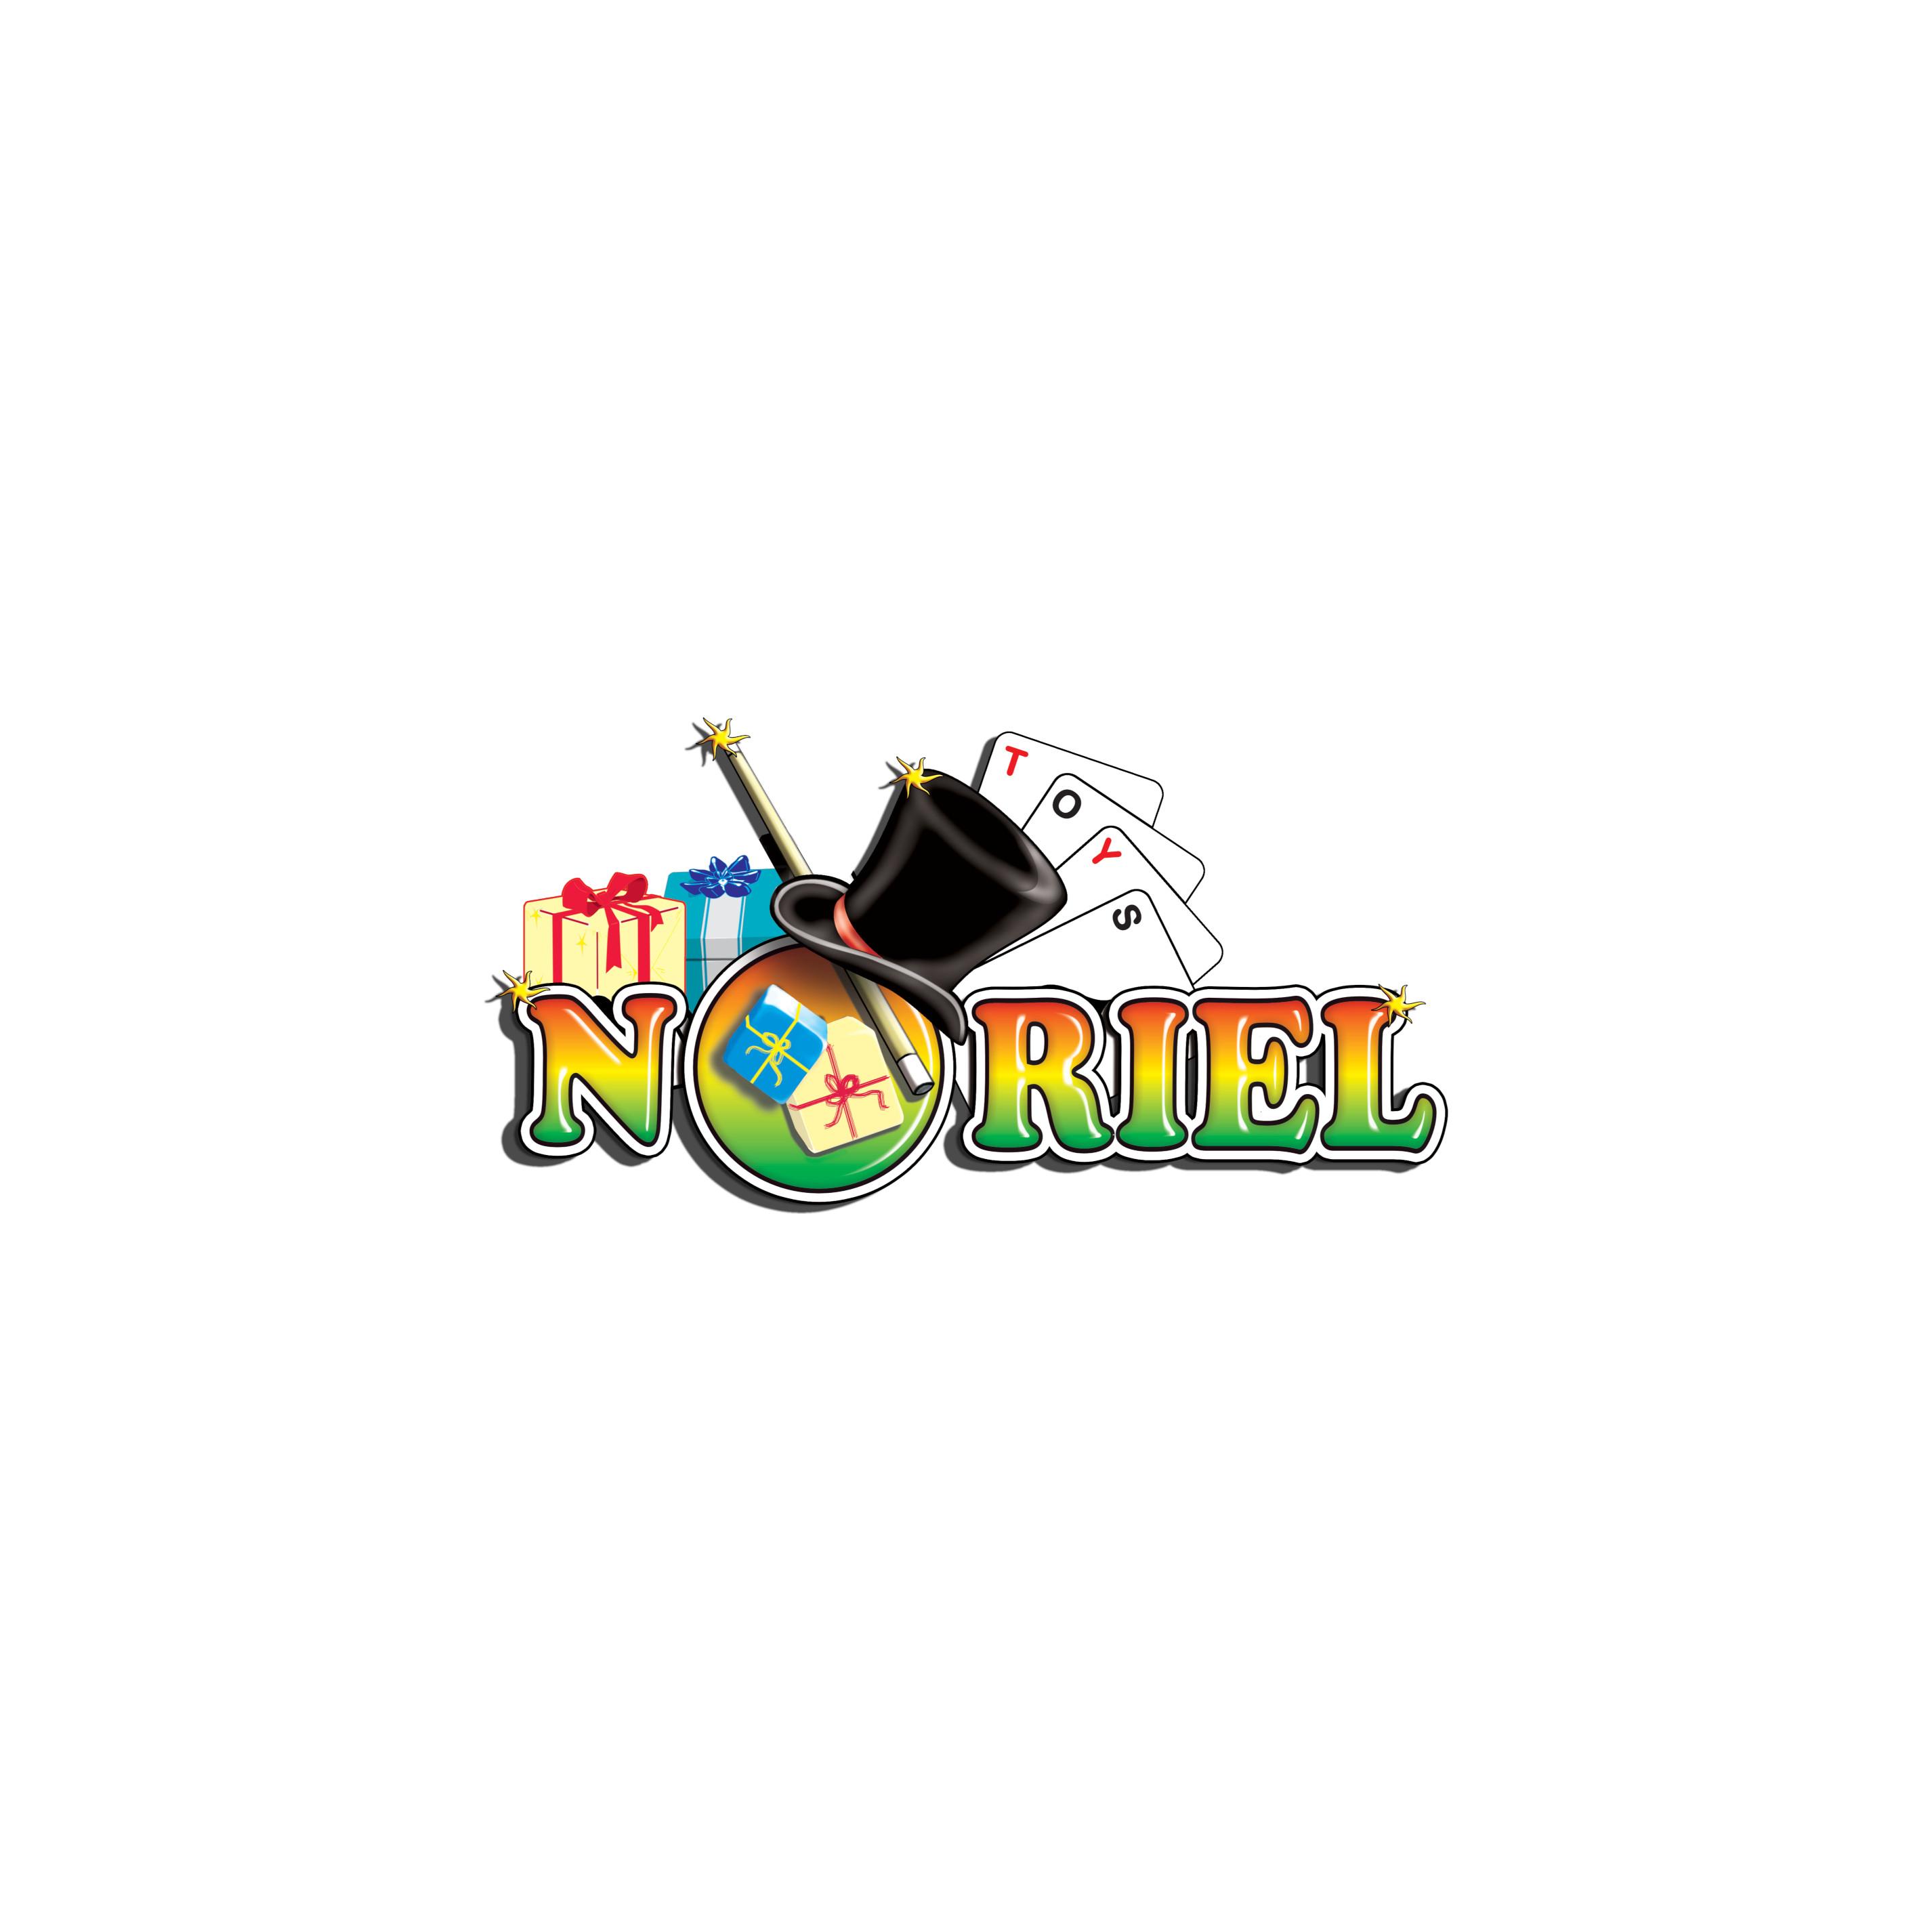 3750_3751_001 - Figurina interactiva WowWee Fingerlings Baby Sloth Kingsley - Maro3